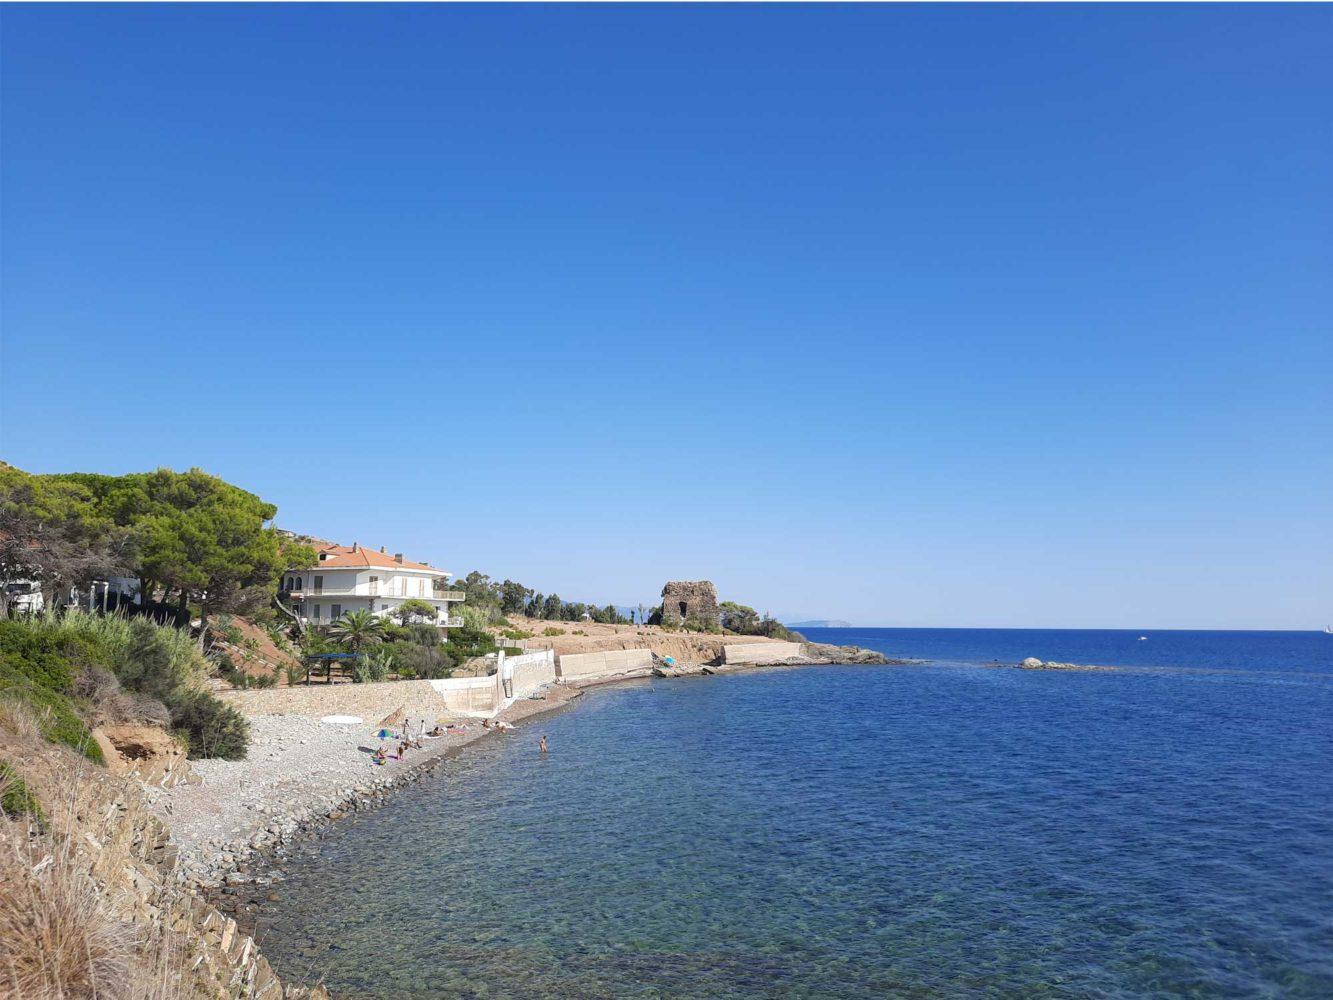 spiaggia-torre-caleo-acciaroli-2